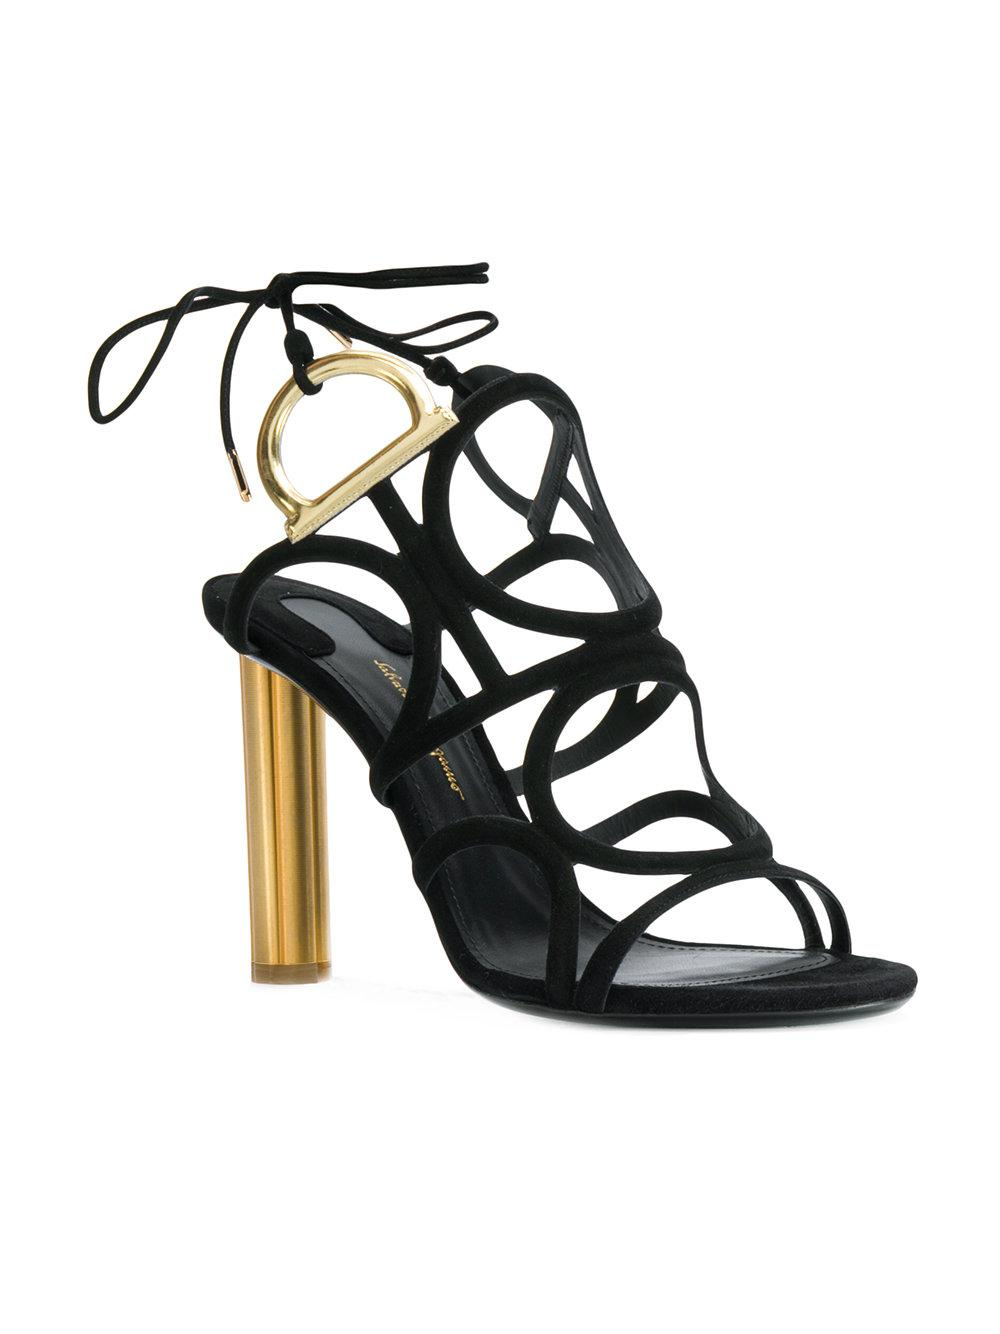 b1571666dd0e Lyst - Ferragamo Vinci 105 Black Suede Golden Heel Sandals in Black - Save  4%